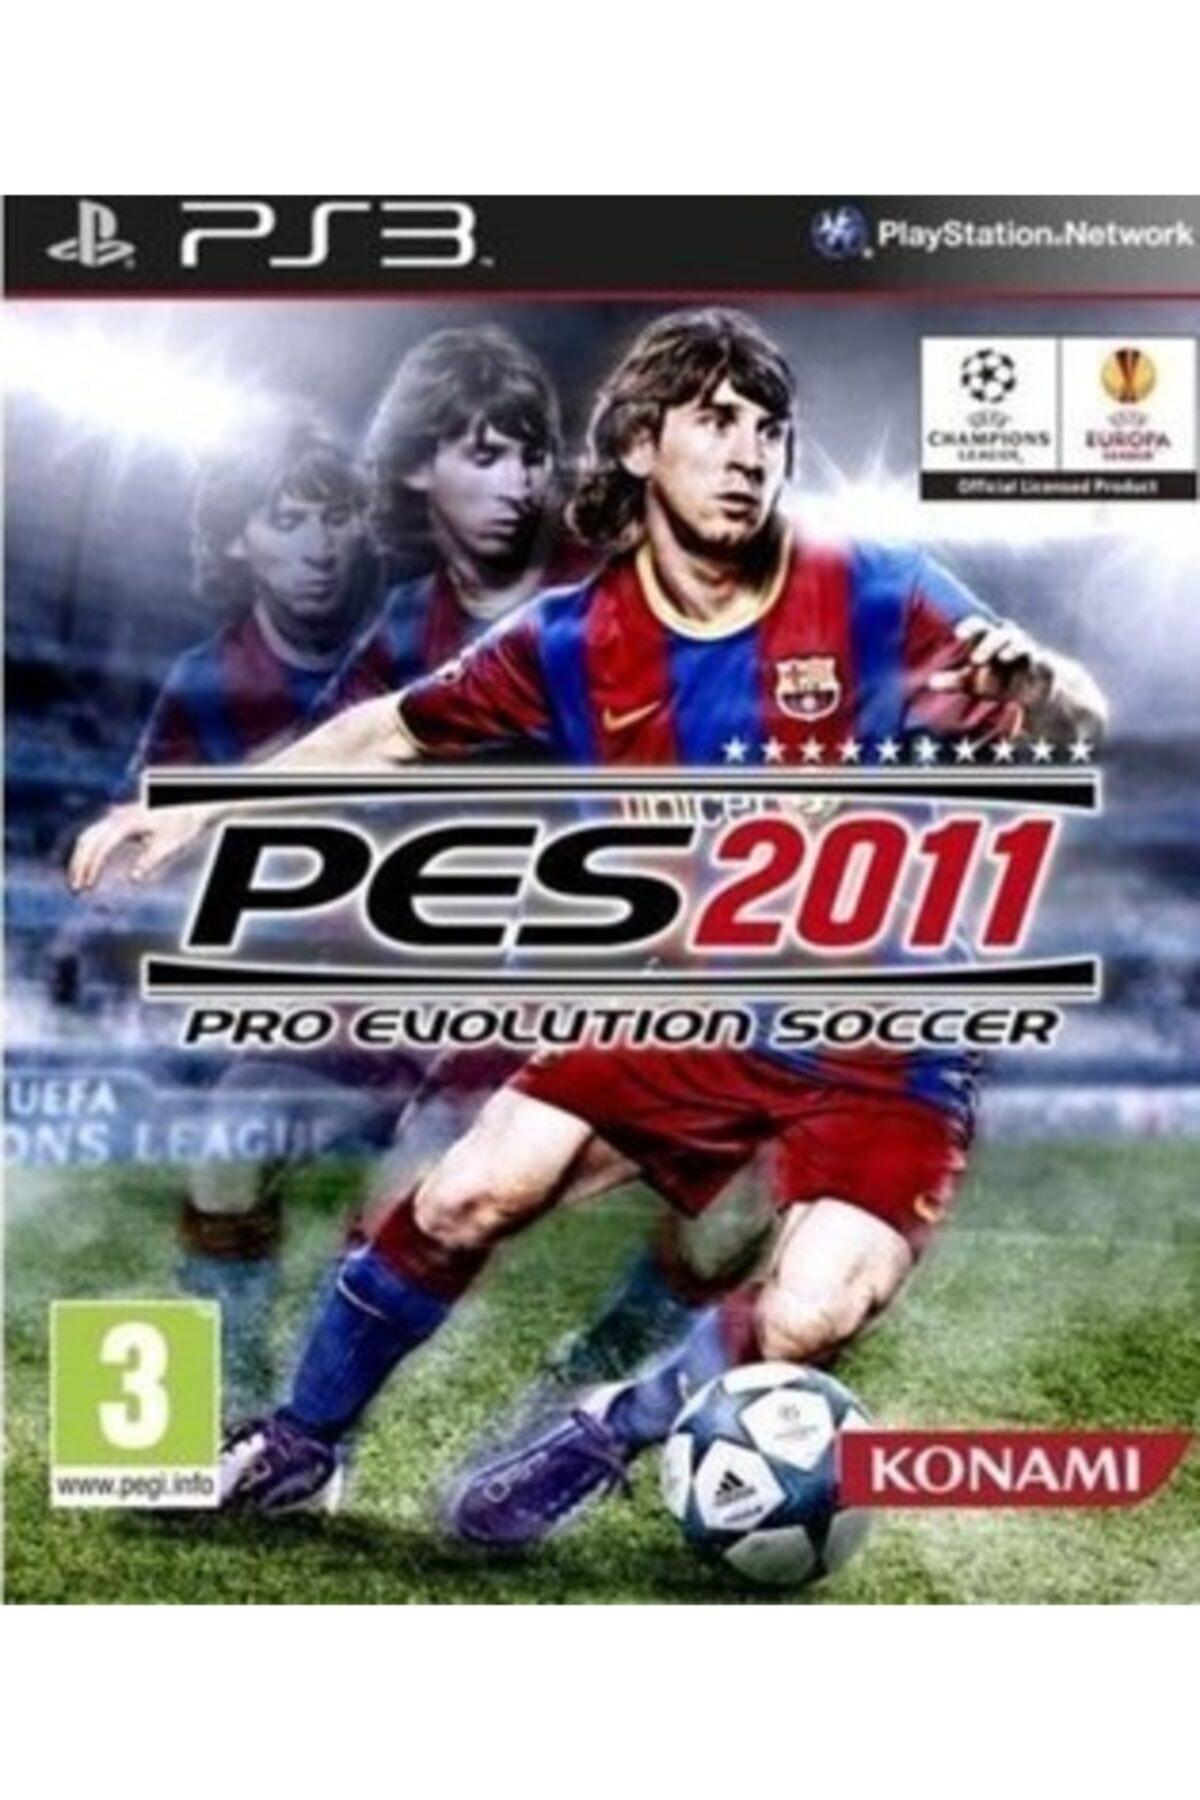 KONAMI Ps3 Pes 2011 - Orjinal Oyun - Sıfır Jelatin 1